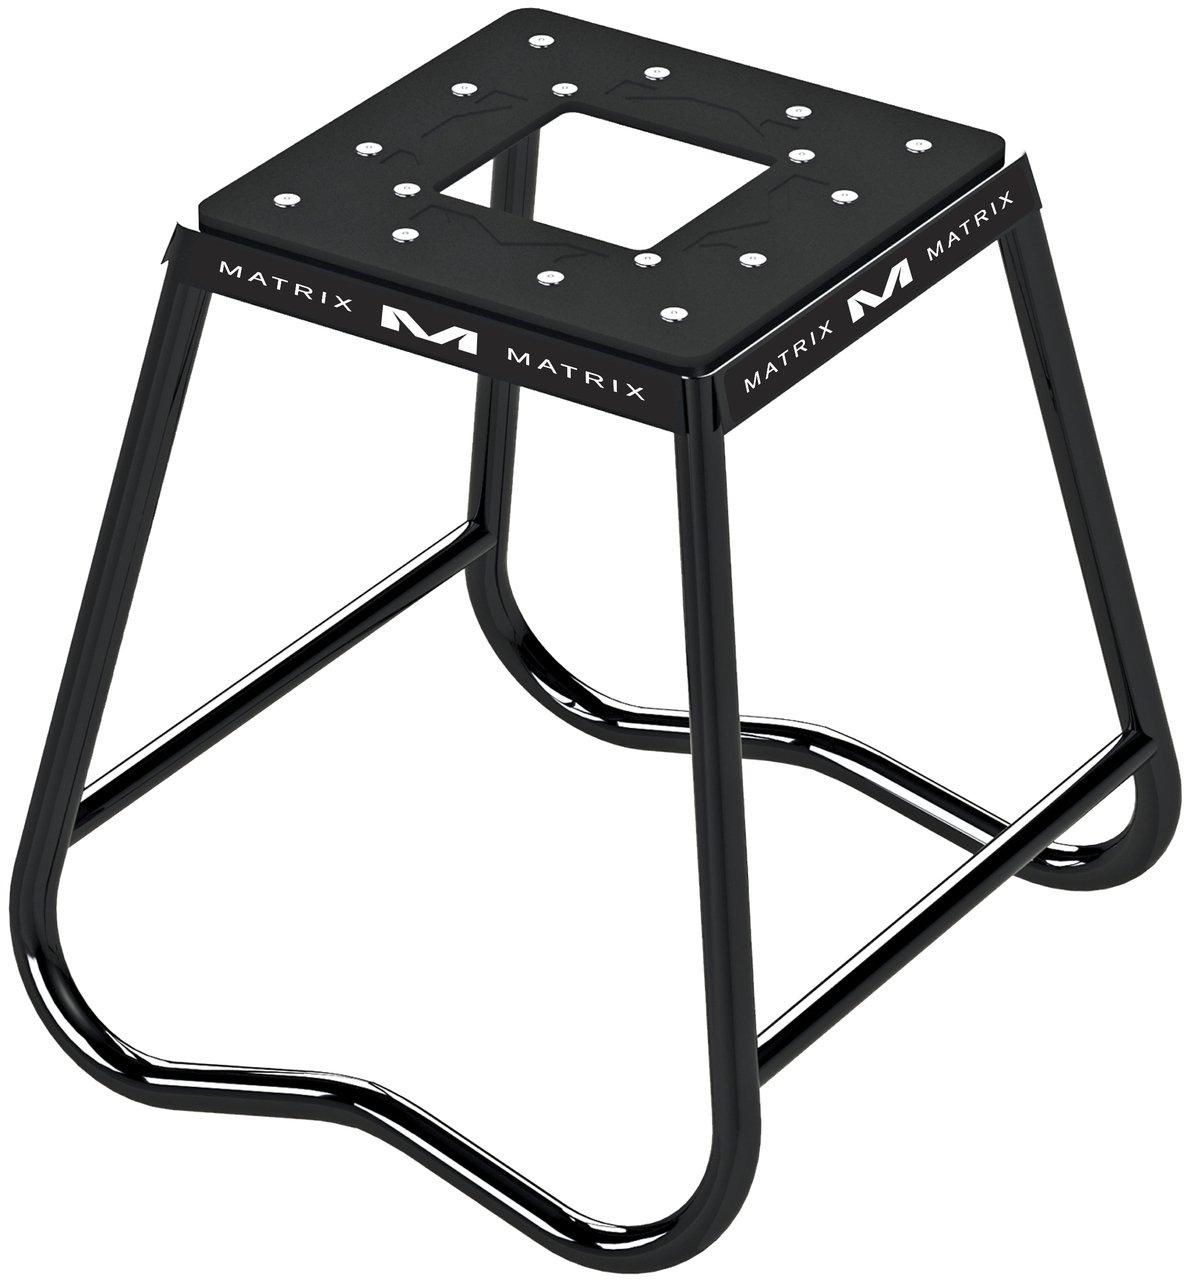 Matrix Concepts C1 Carbon Steel Stand, Black by Matrix Concepts